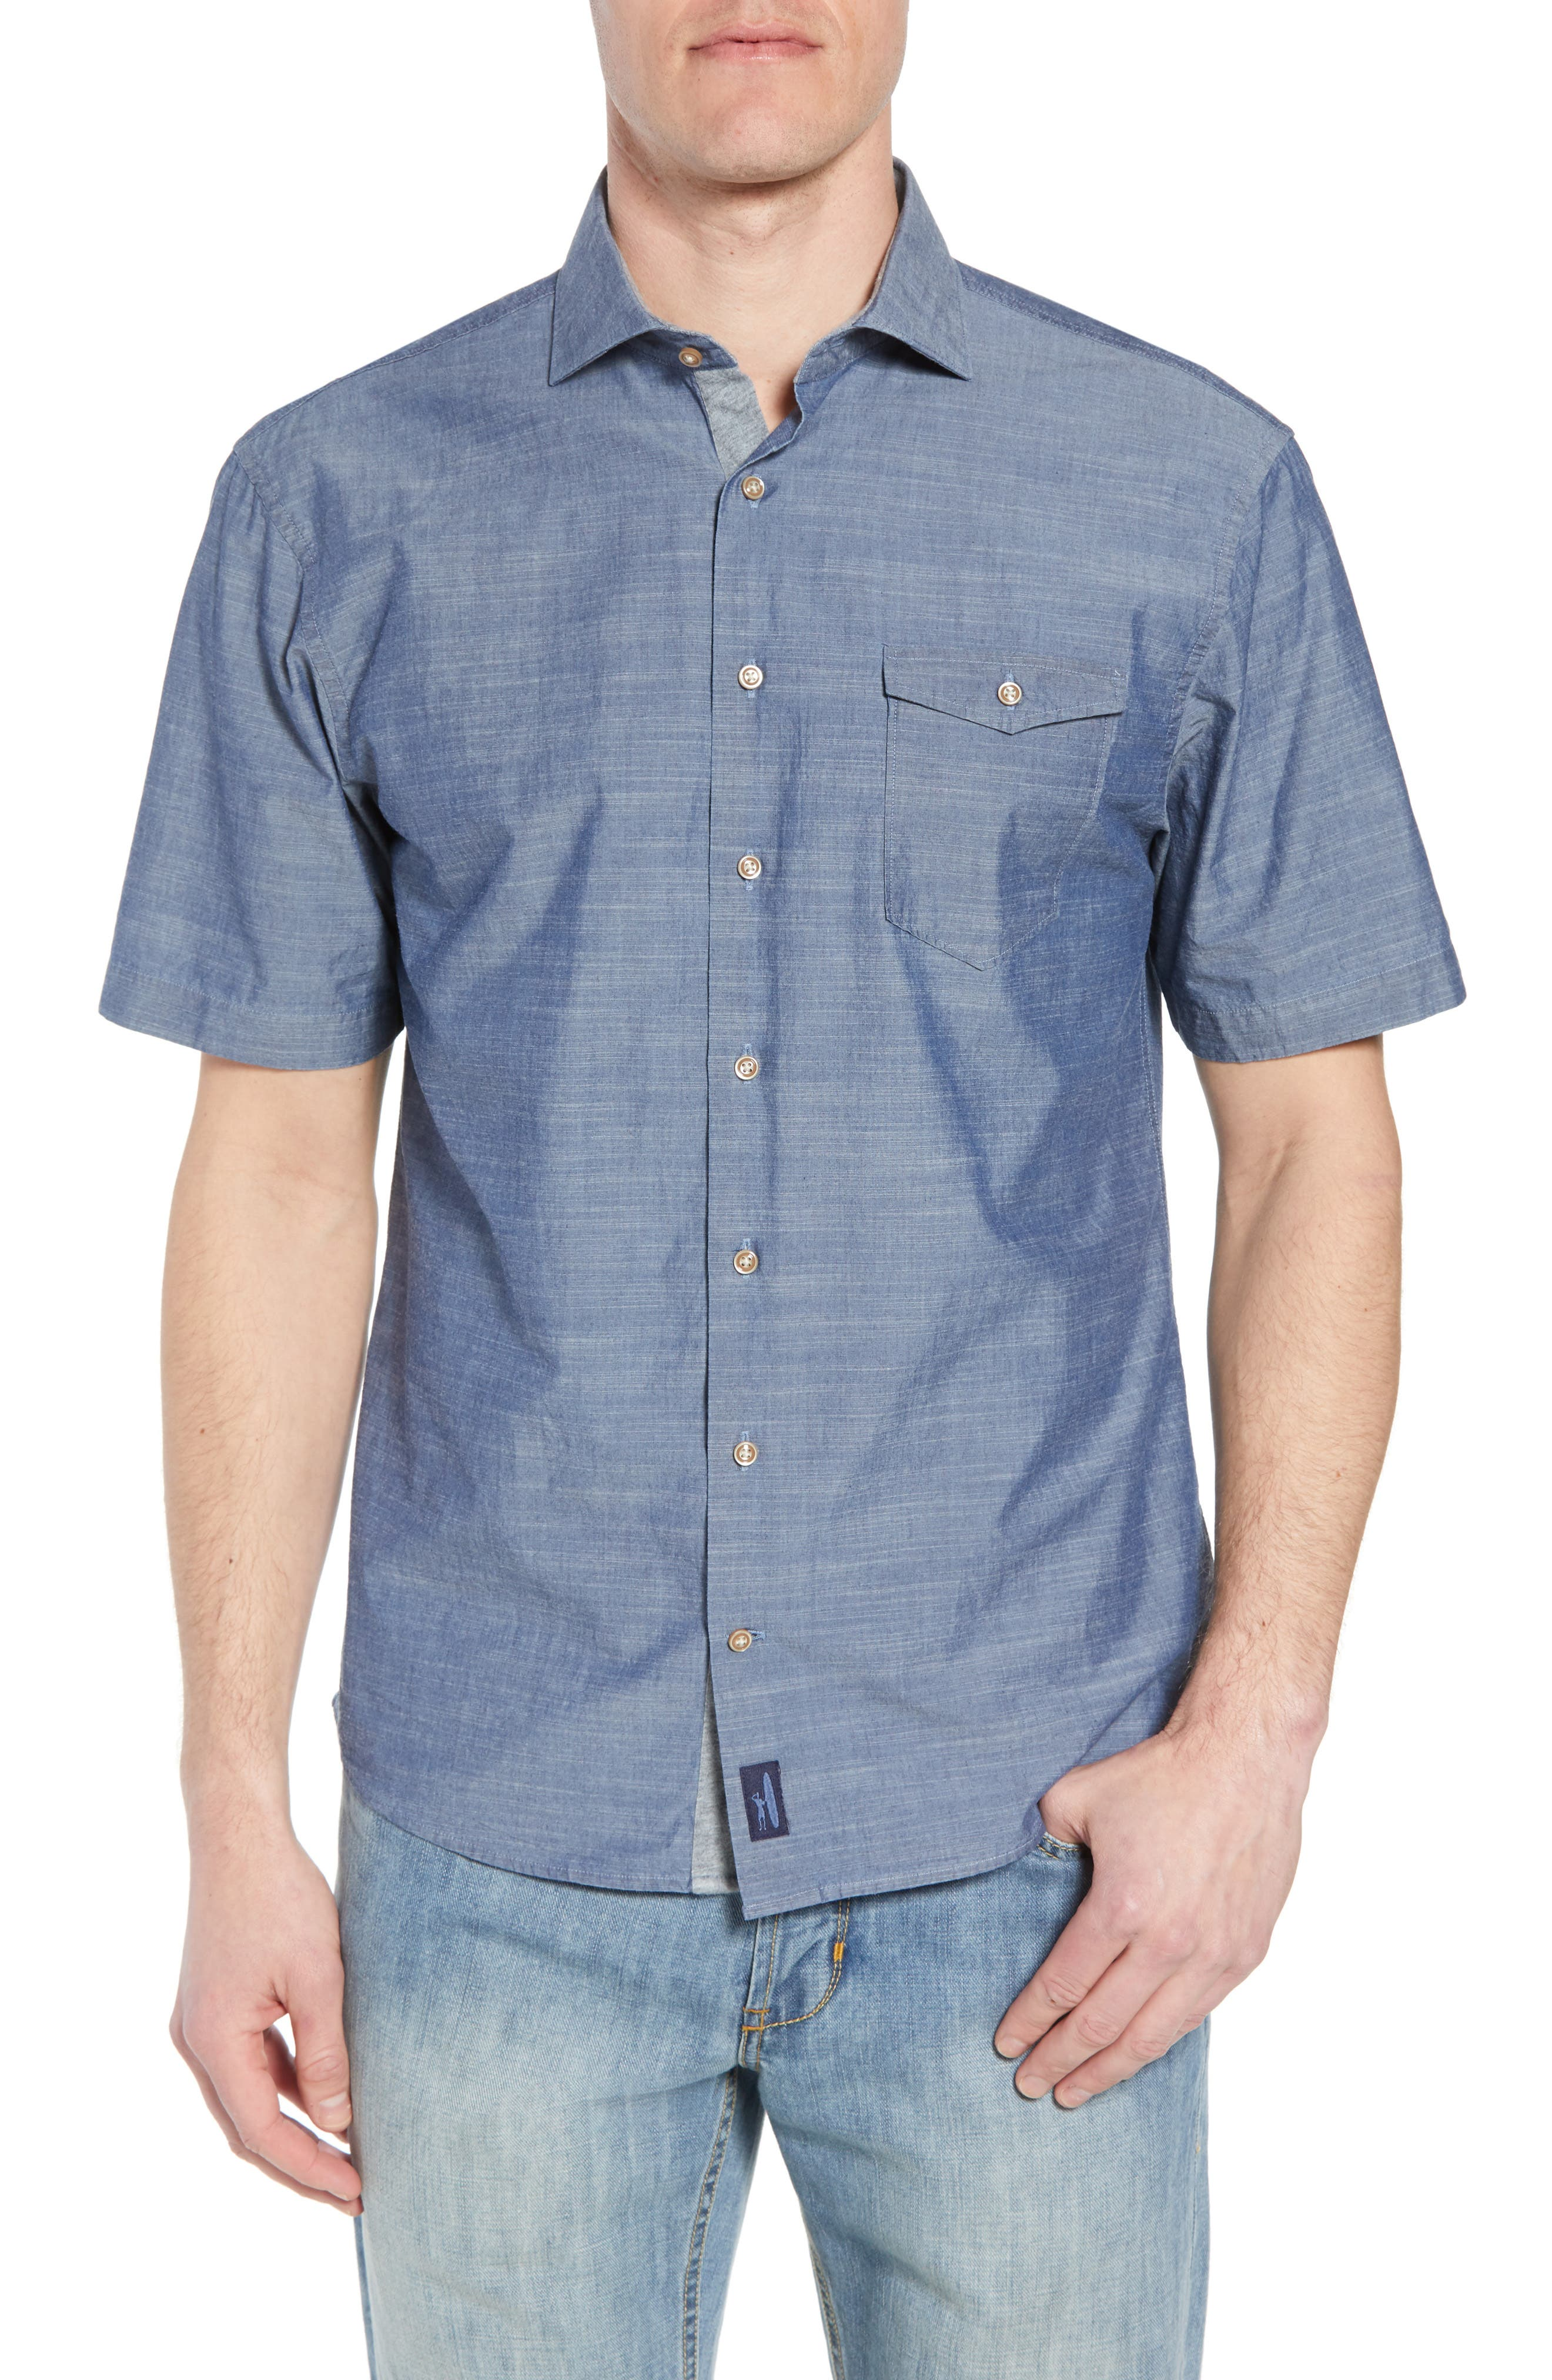 Lucas Regular Fit Chambray Sport Shirt,                             Main thumbnail 1, color,                             Indigo